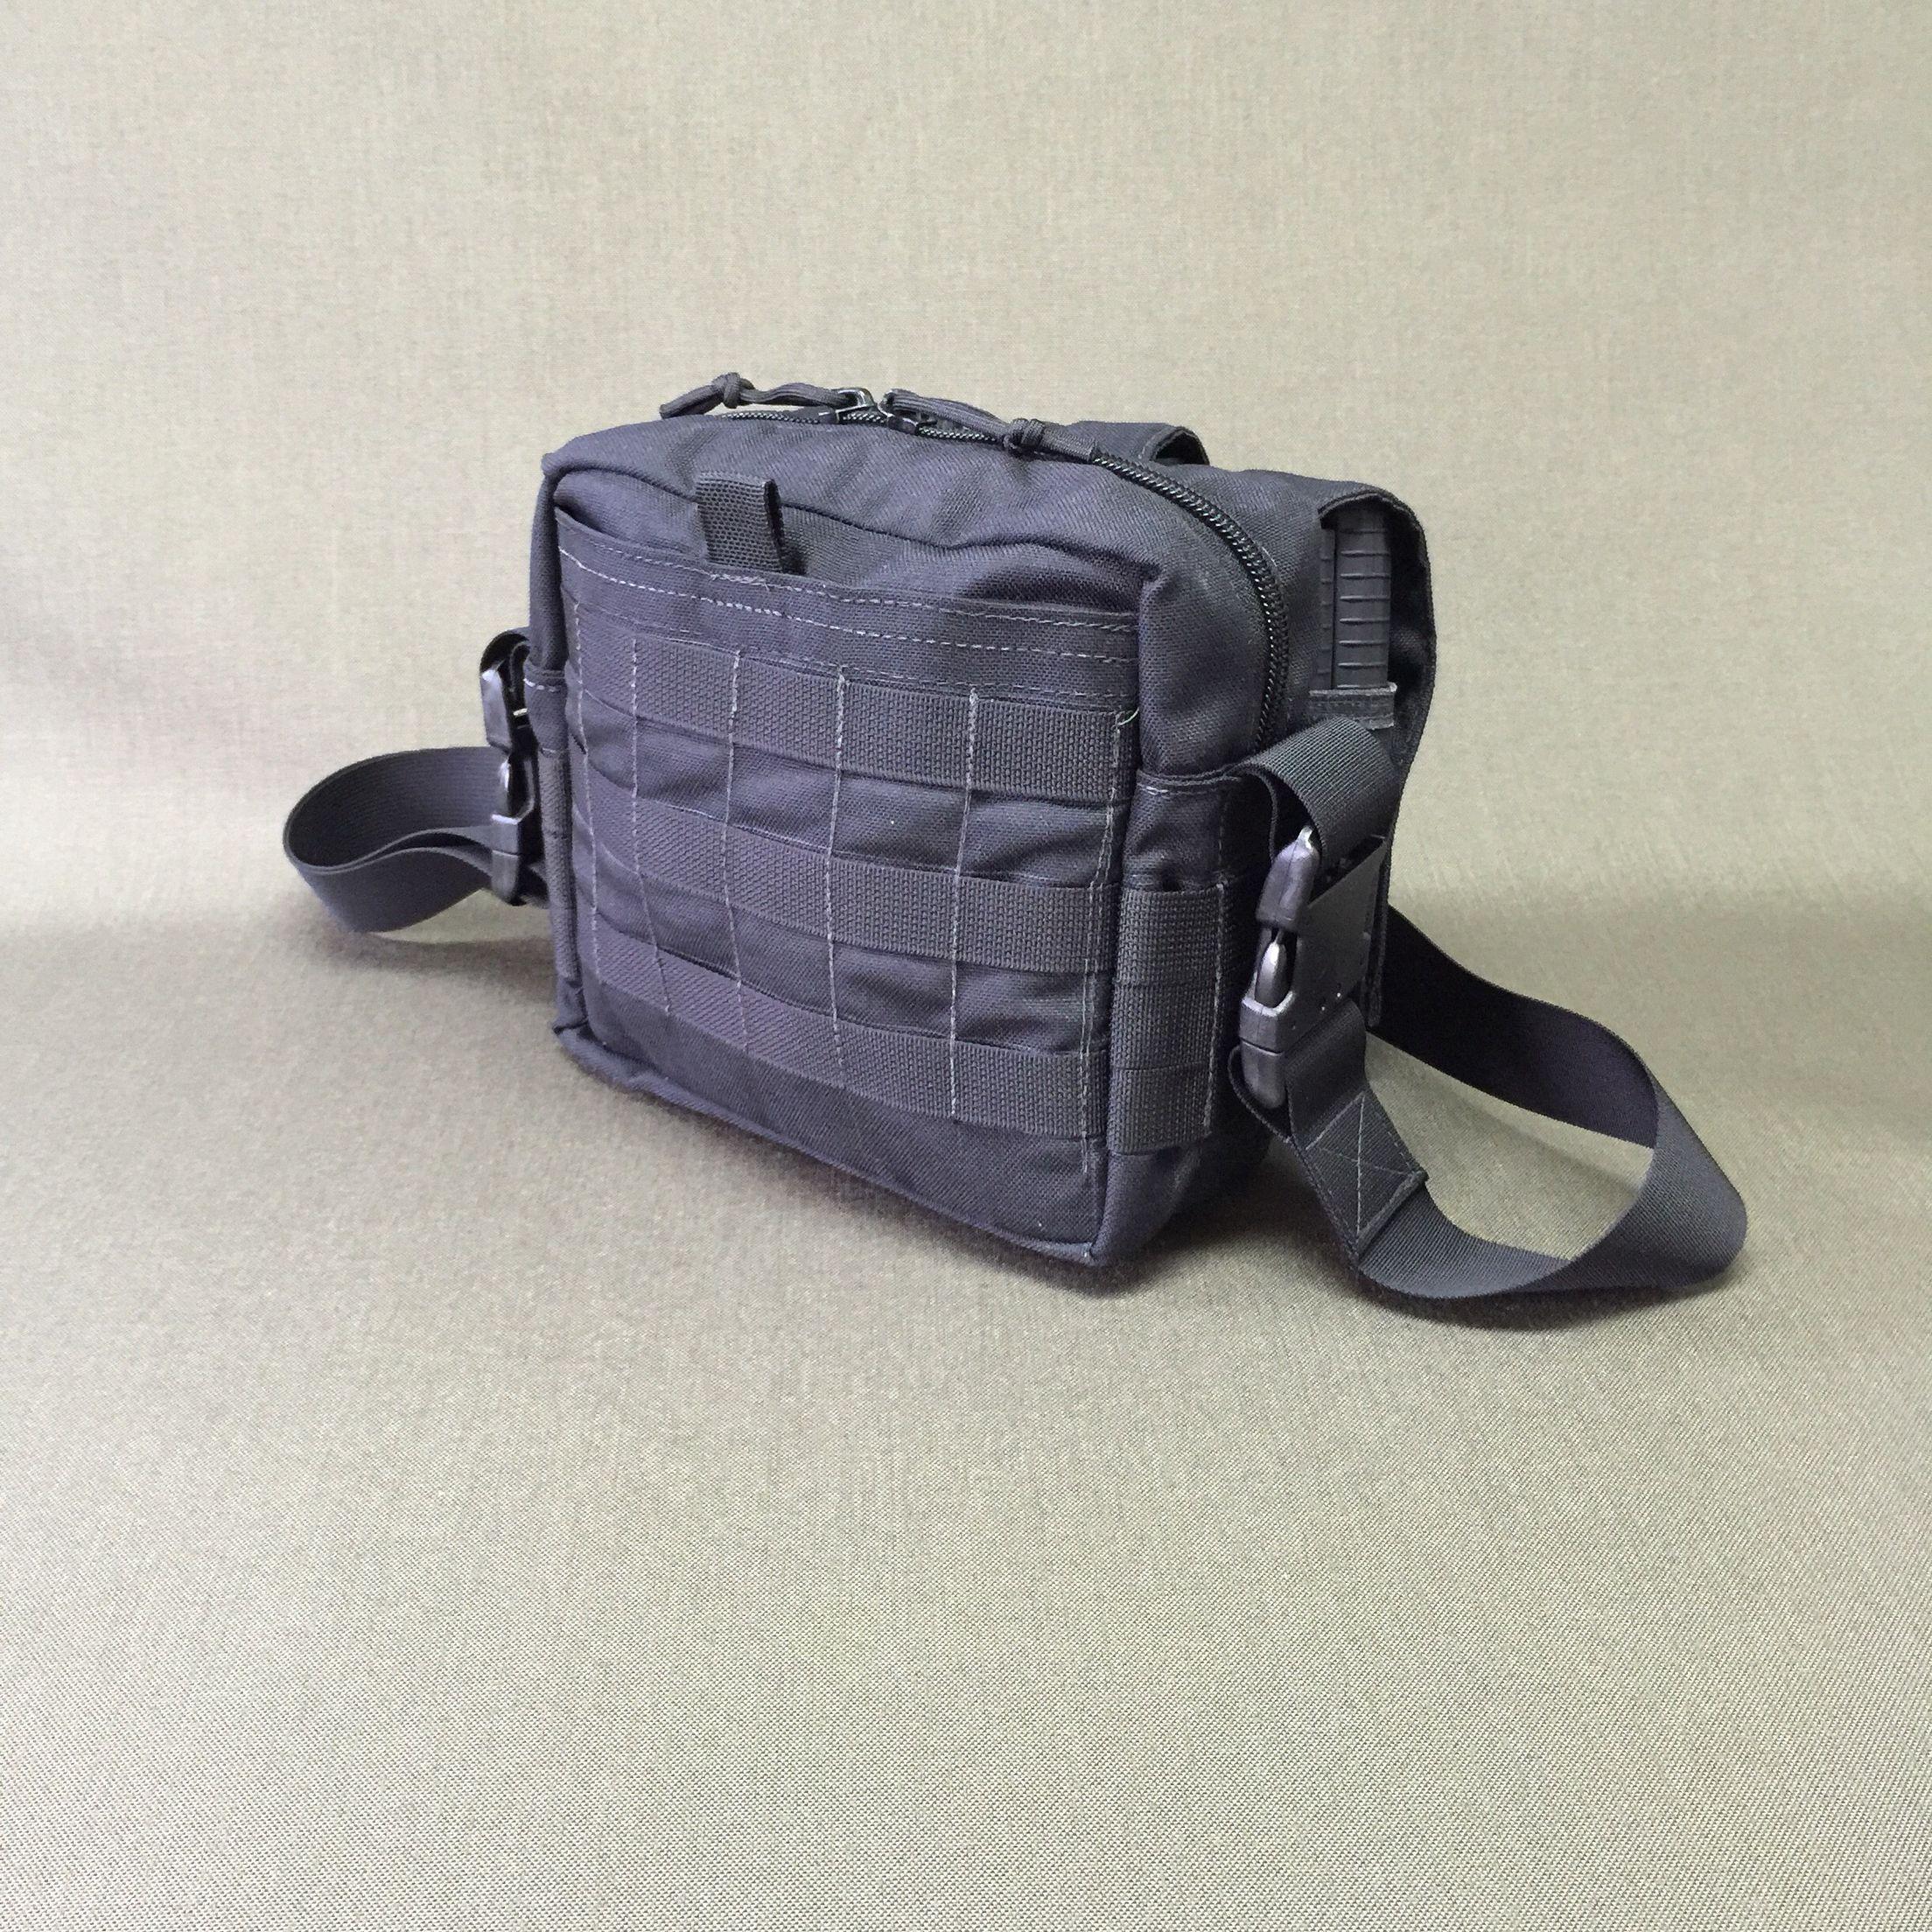 Wilde Built Tactical Nylon Active Shooter Bag MOLLE side.  Hidden pocket under MOLLE for concealed pistol.